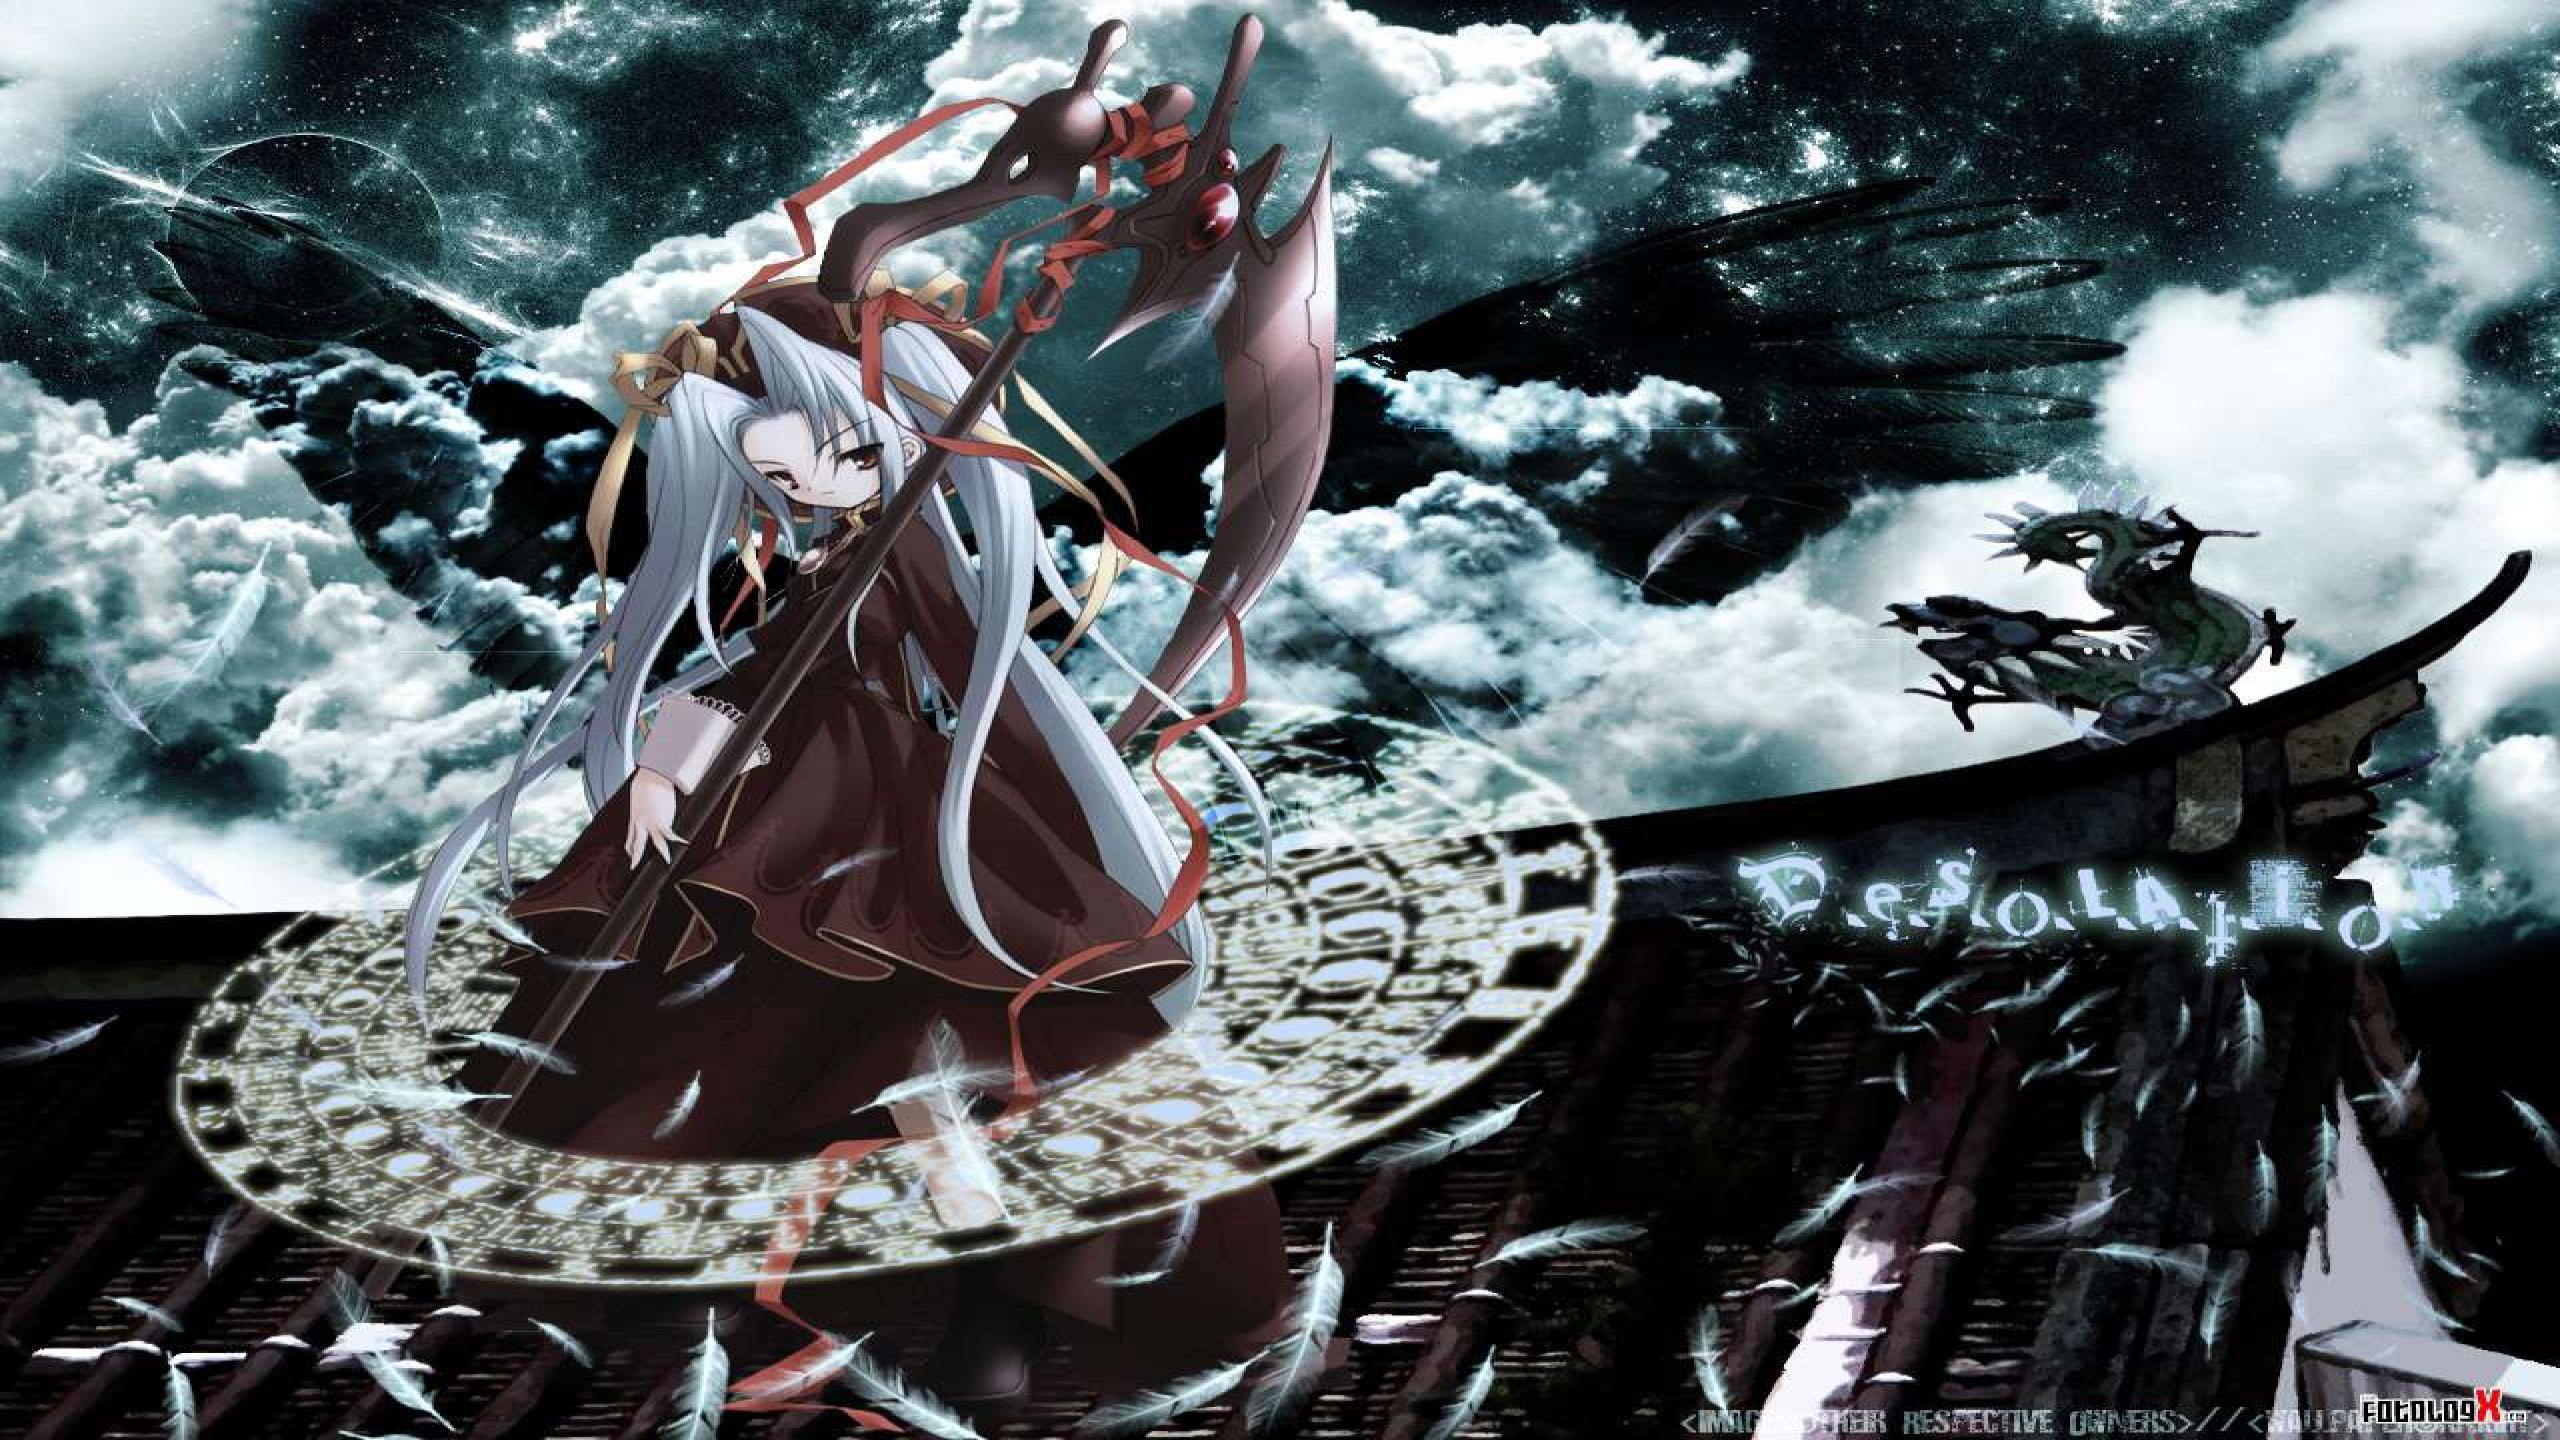 Anime hd wallpaper 2560x1440 wallpapersafari - Wallpaper hd 1920x1080 anime ...